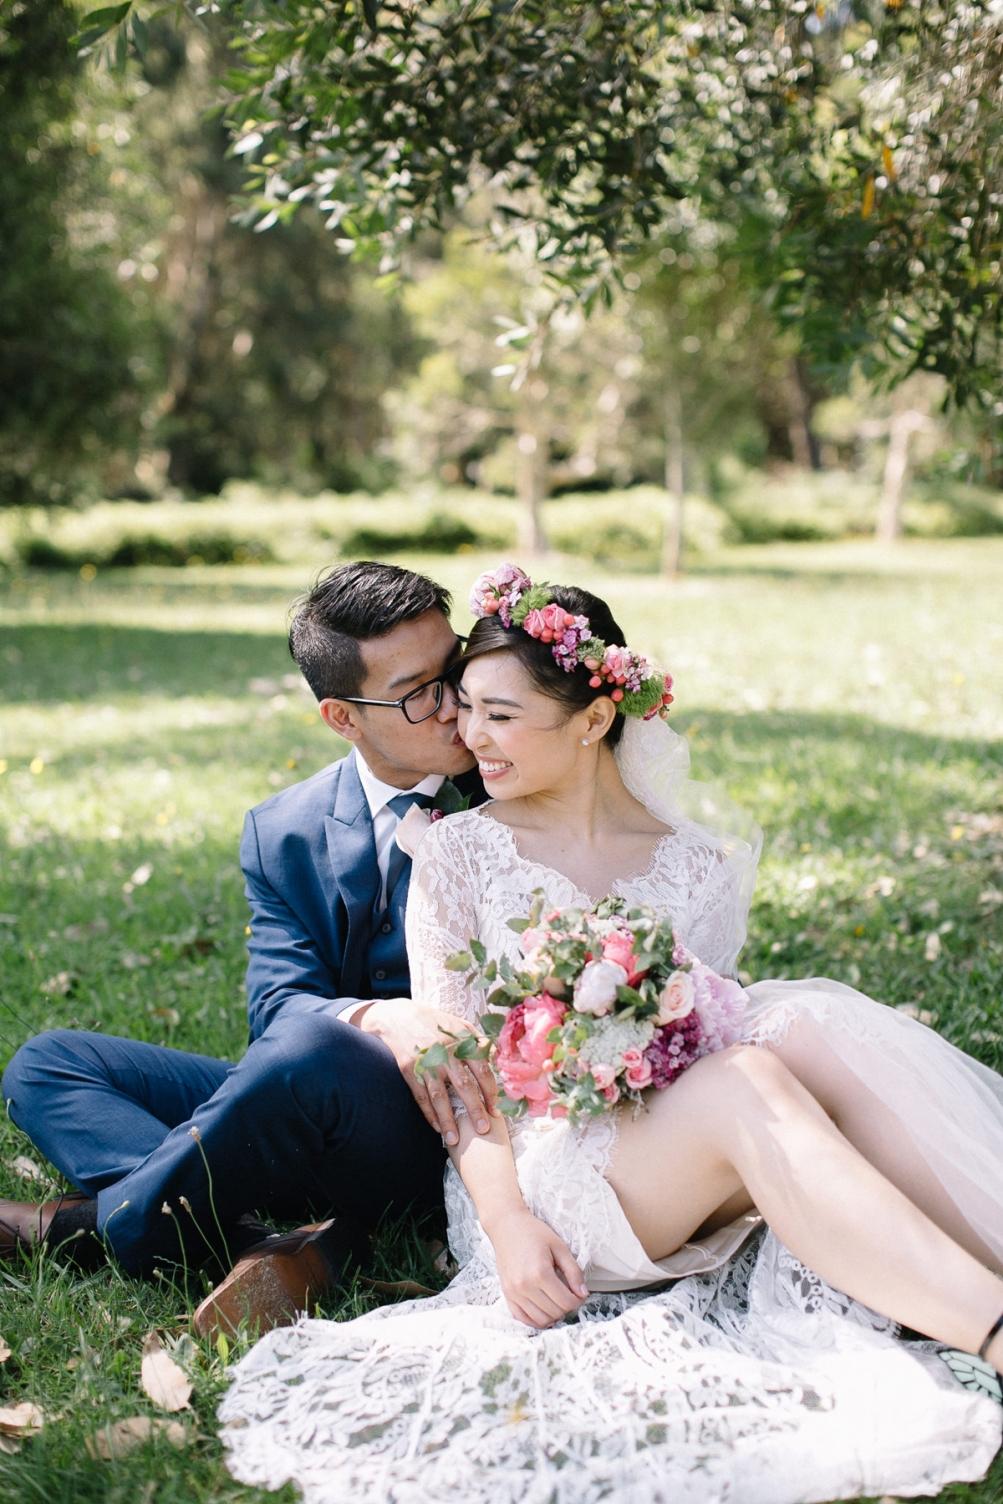 059-sydney-wedding-annie-martin-